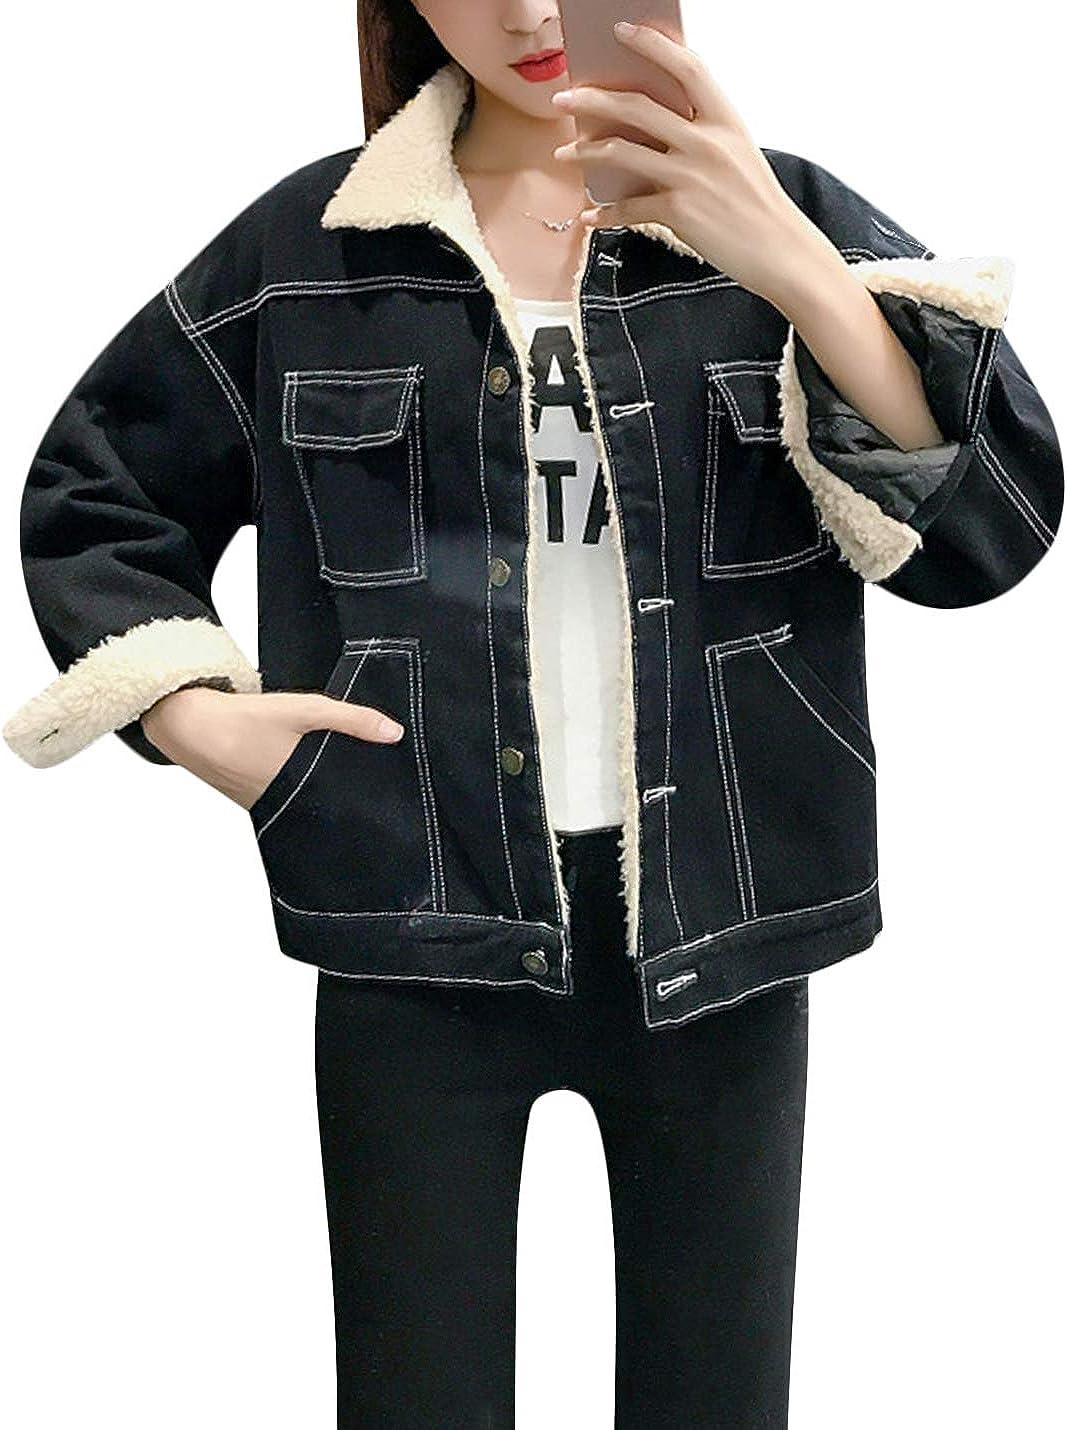 Year-end gift Springrain Bargain sale Women's Winter Casual Lined Sherpa Jacket Denim